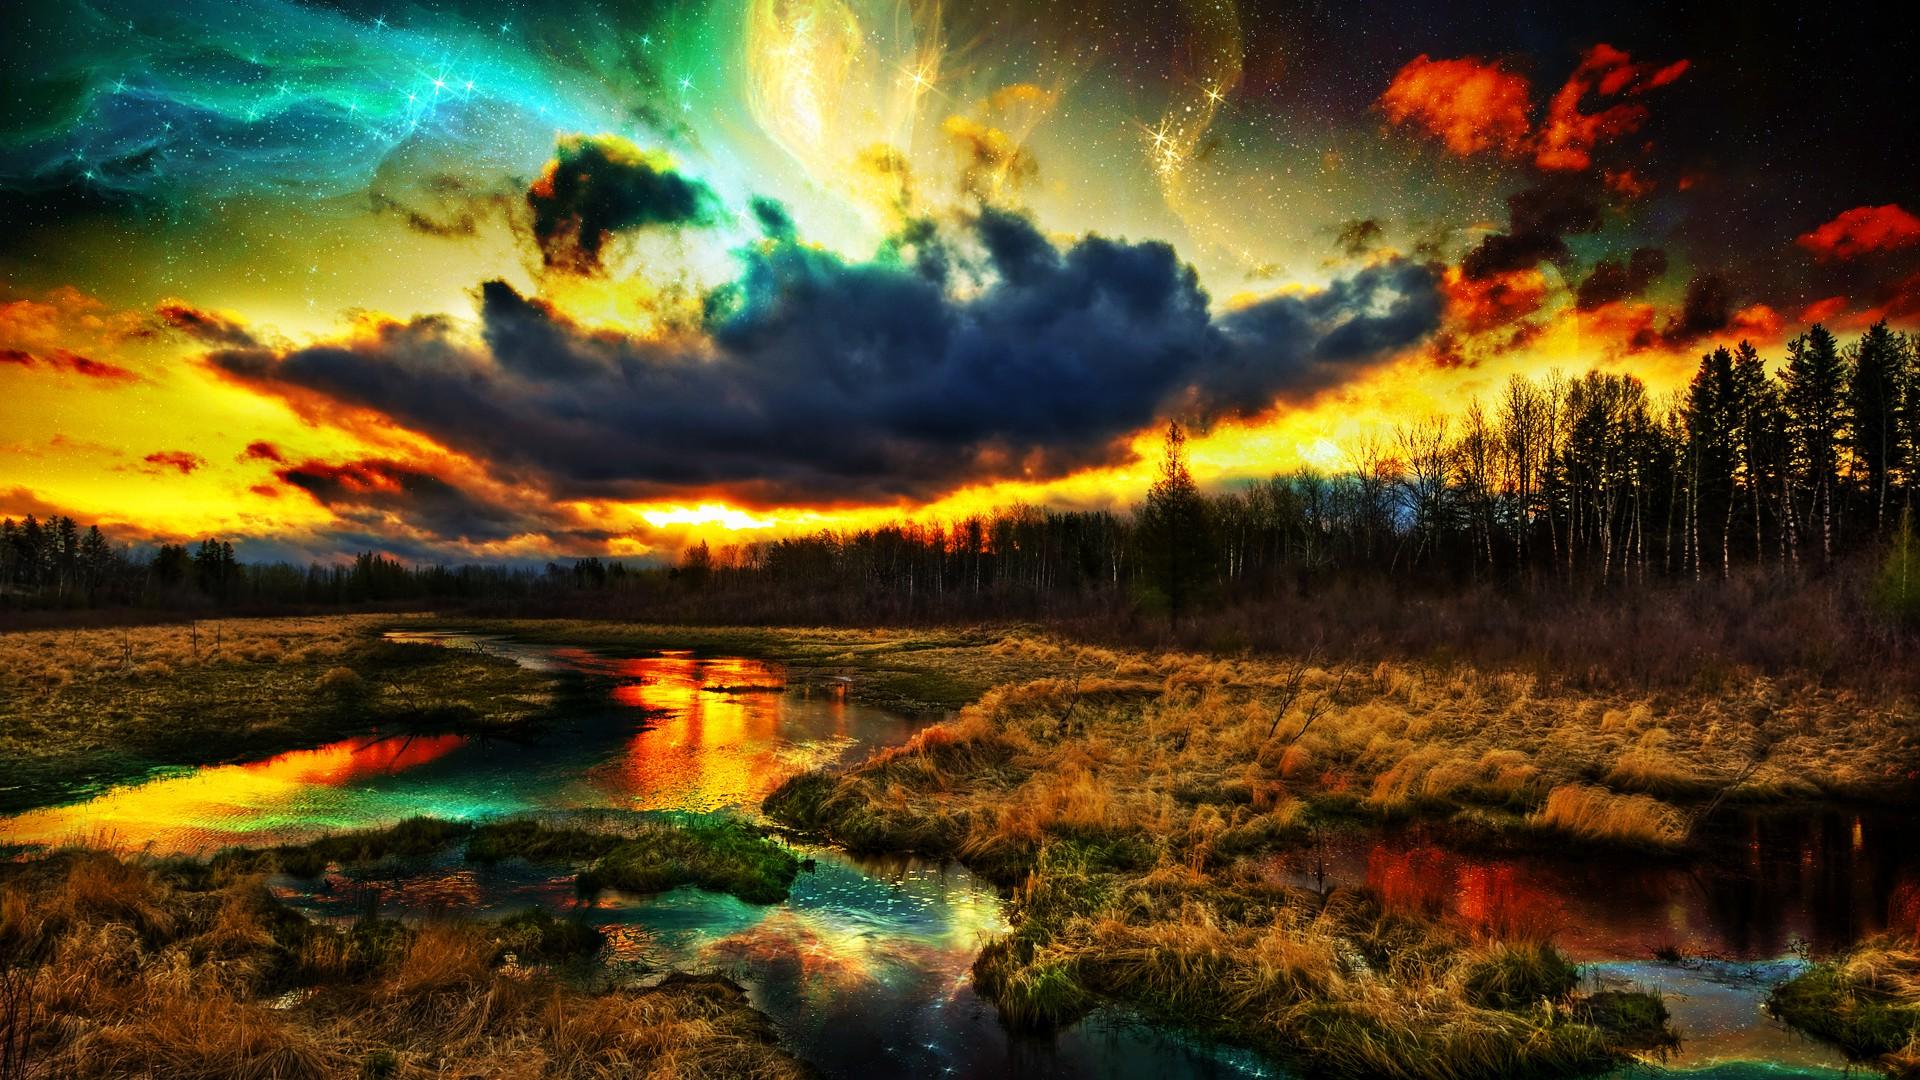 Colourful Fantasy Cloud Backgrounds: Wallpaper : 1920x1080 Px, Clouds, Colorful, Digital Art